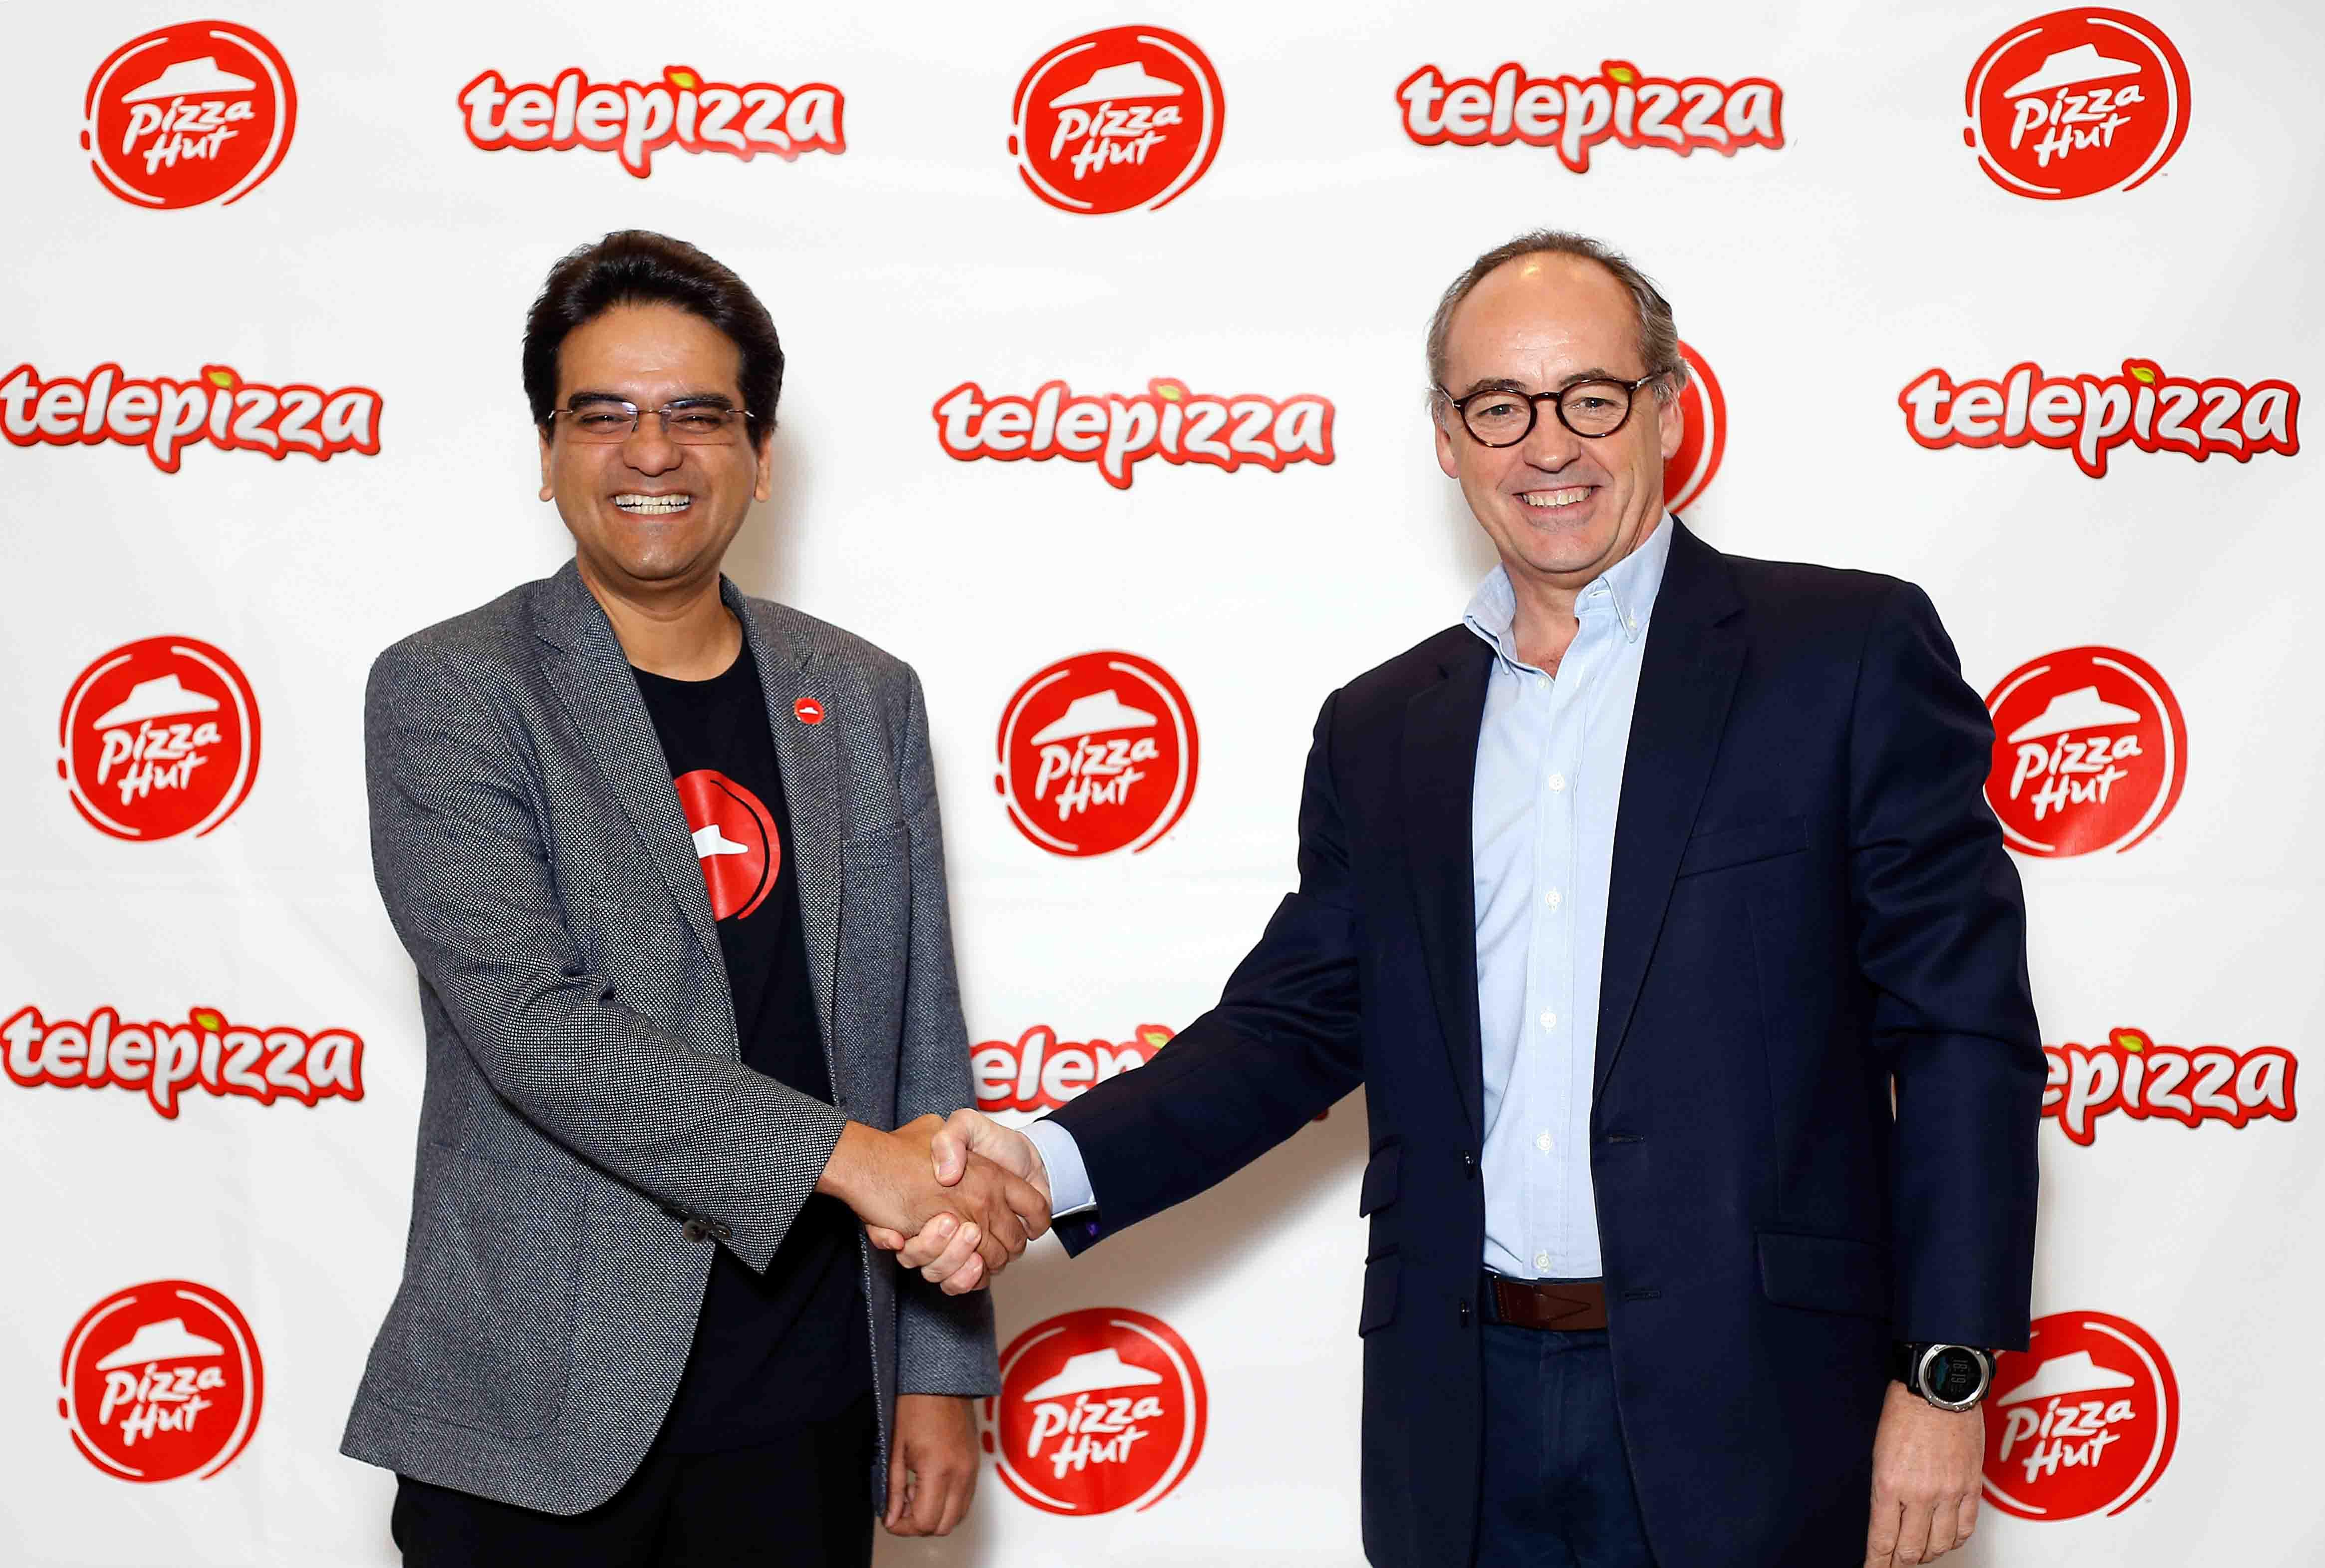 Telepizza Pizza Hut